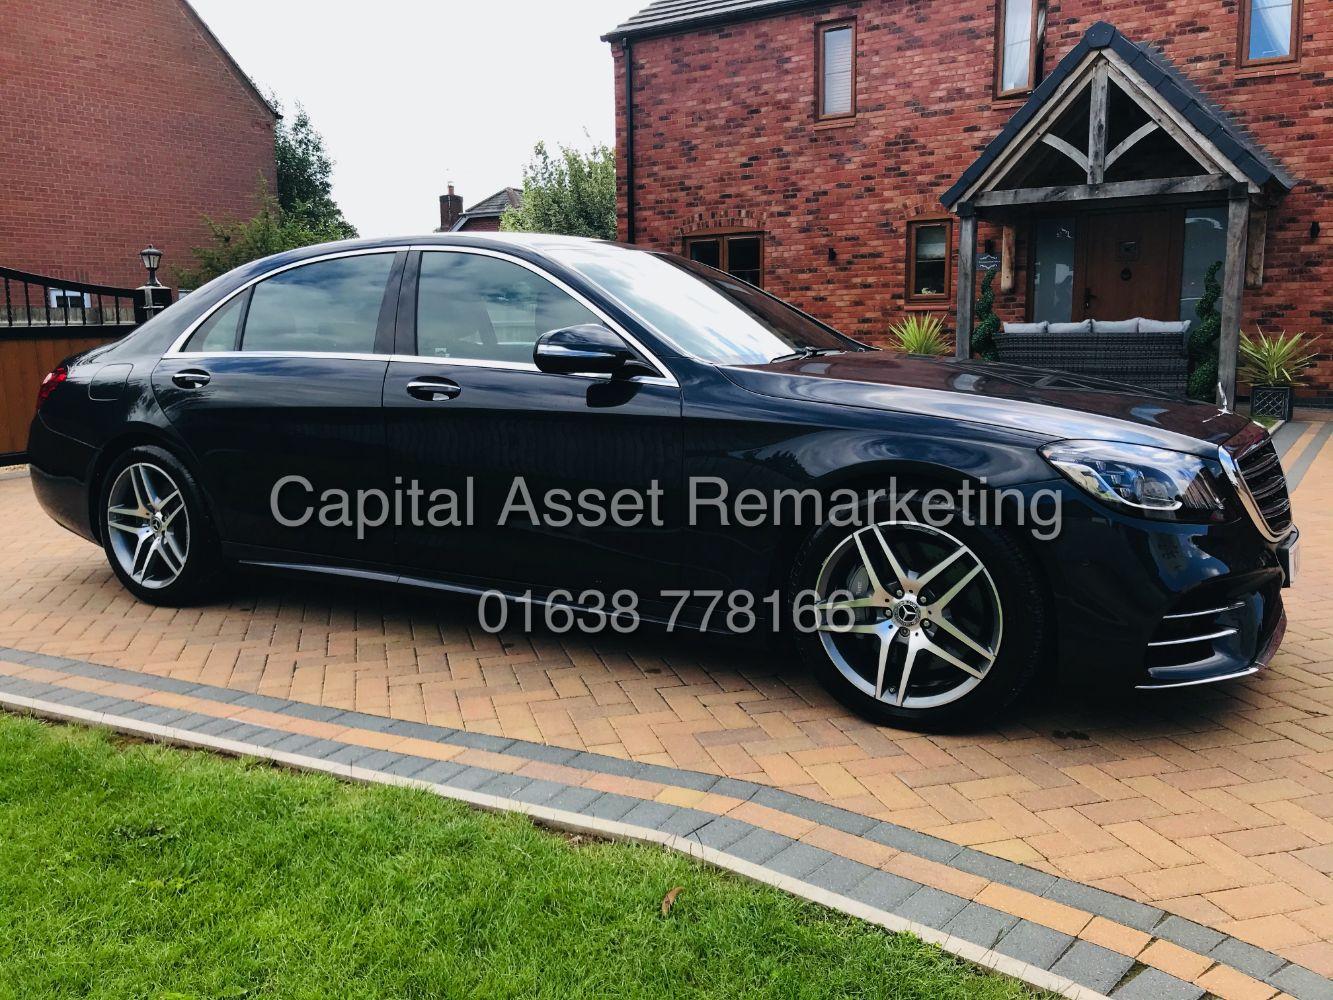 2020 (New Model) Range Rover Evoque *R-Dynamic* - 2019 Mercedes-Benz S350d *LWB - AMG Executive* - 2018 Audi A6 Avant *Executive* + Many More